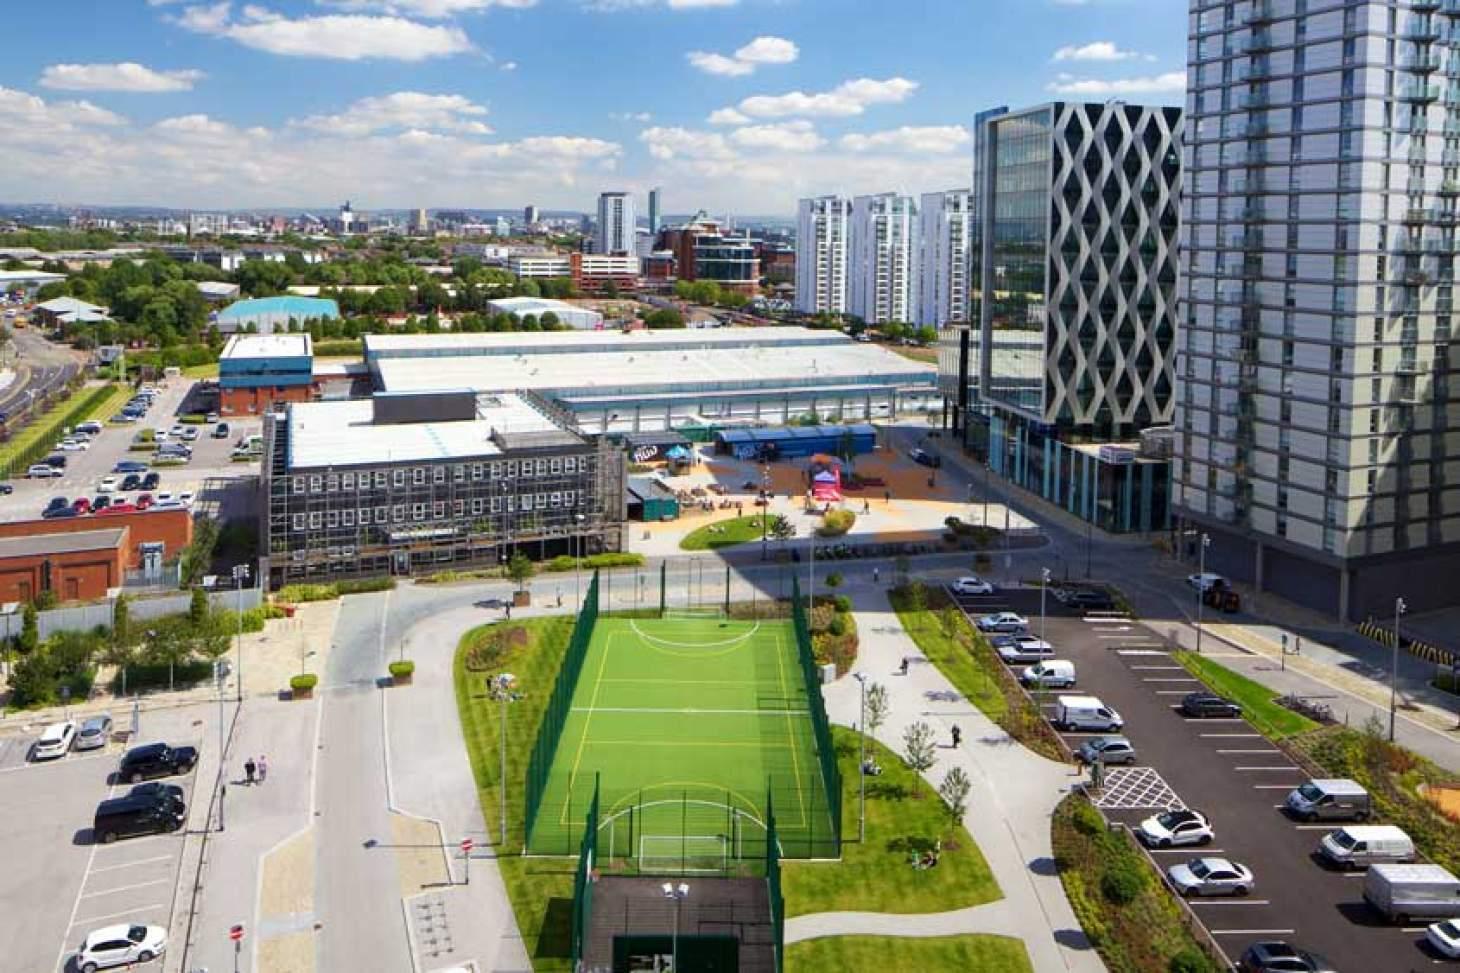 The Pitch - MediaCityUK 5 a side | 3G Astroturf football pitch